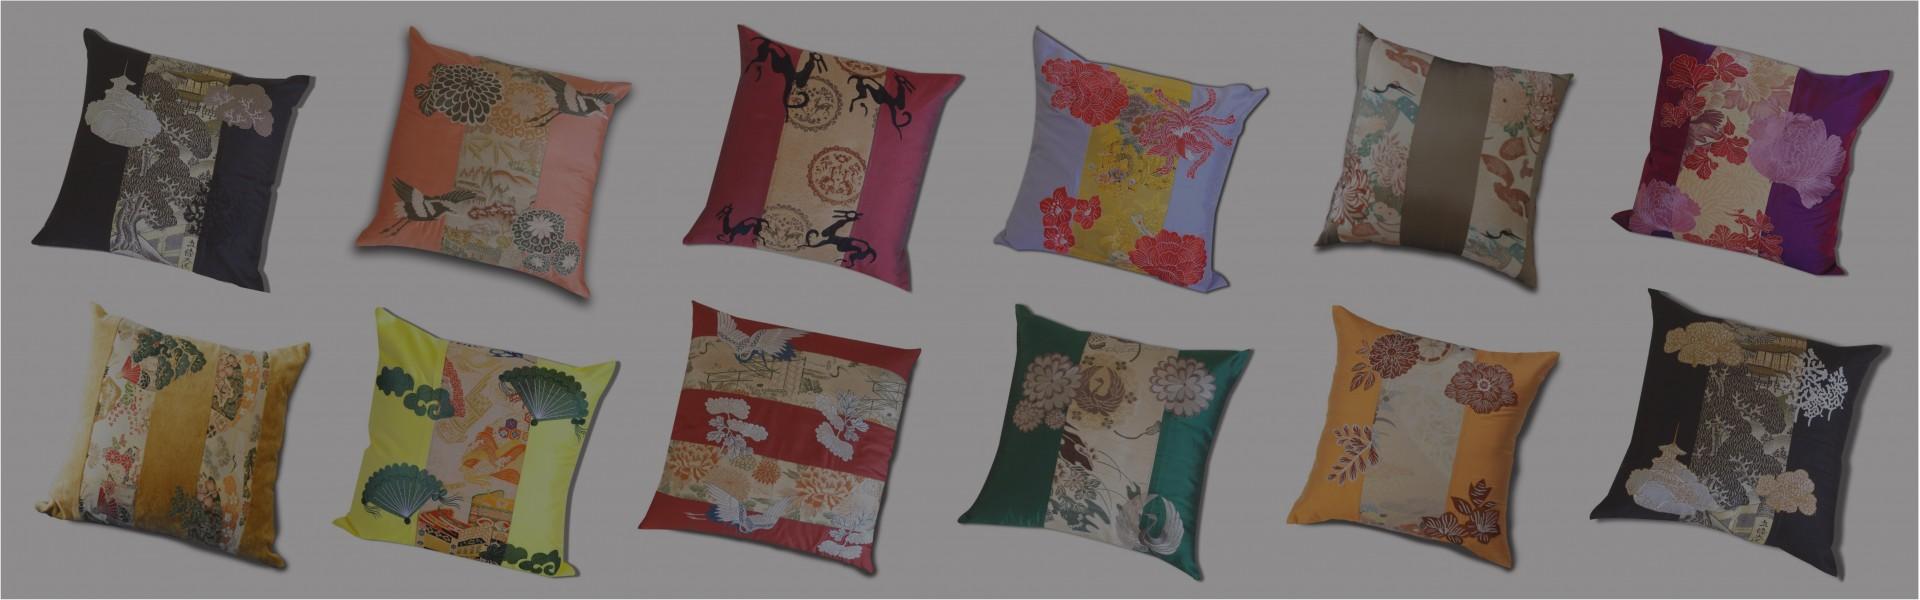 Antique Obi Kimono Cushions